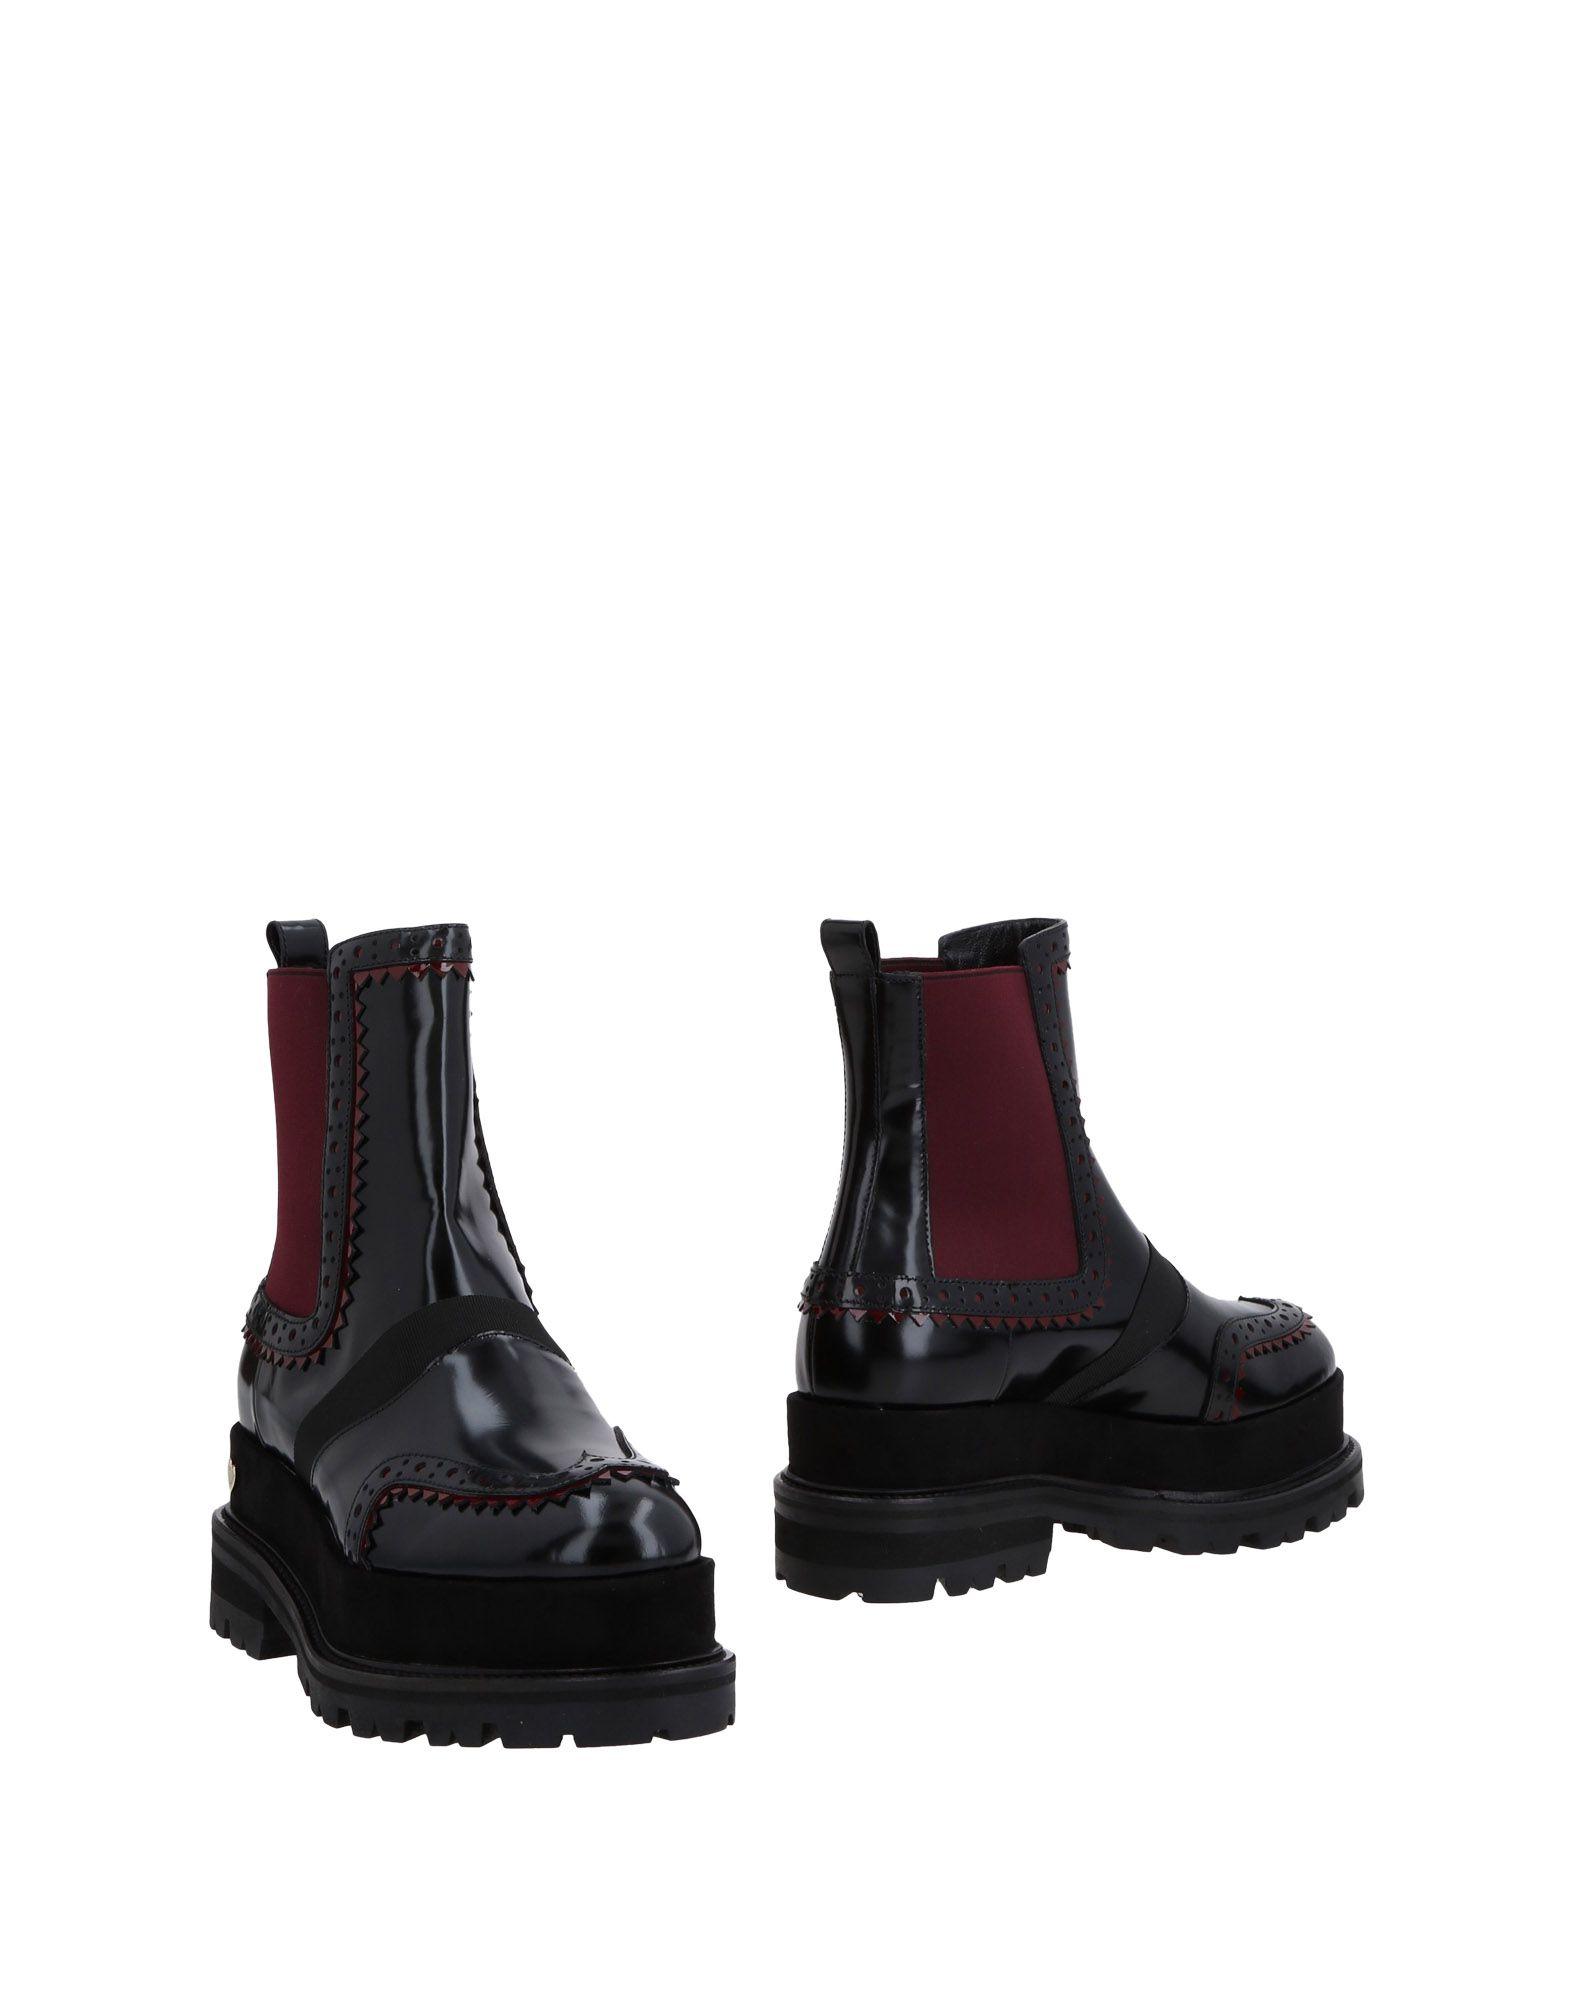 Haltbare Mode Beliebte billige Schuhe Twin 11484957GP Beliebte Mode Schuhe 4100f6